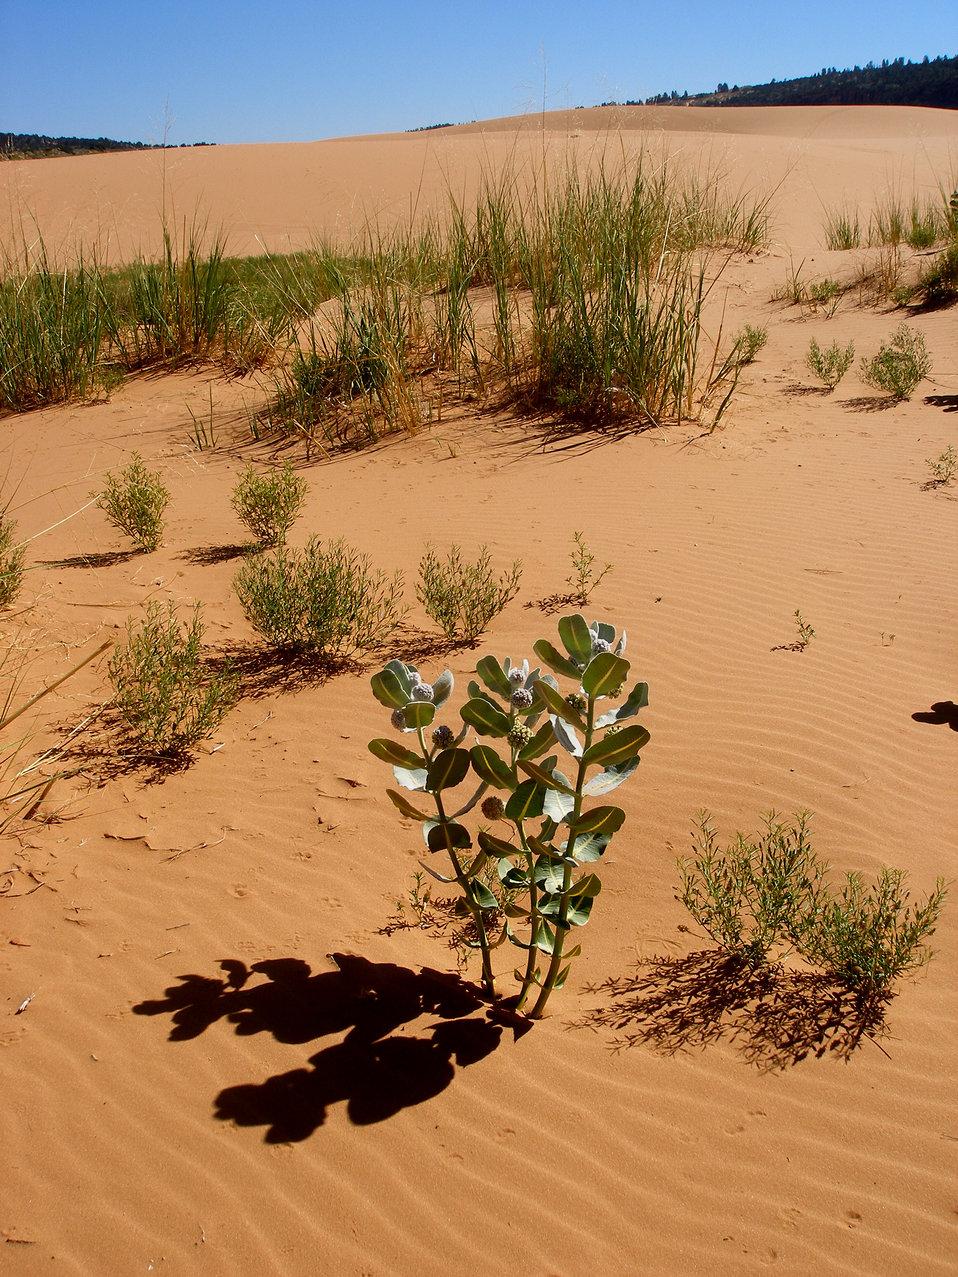 Welsh milkweed (Asclepias welshii) Habitat